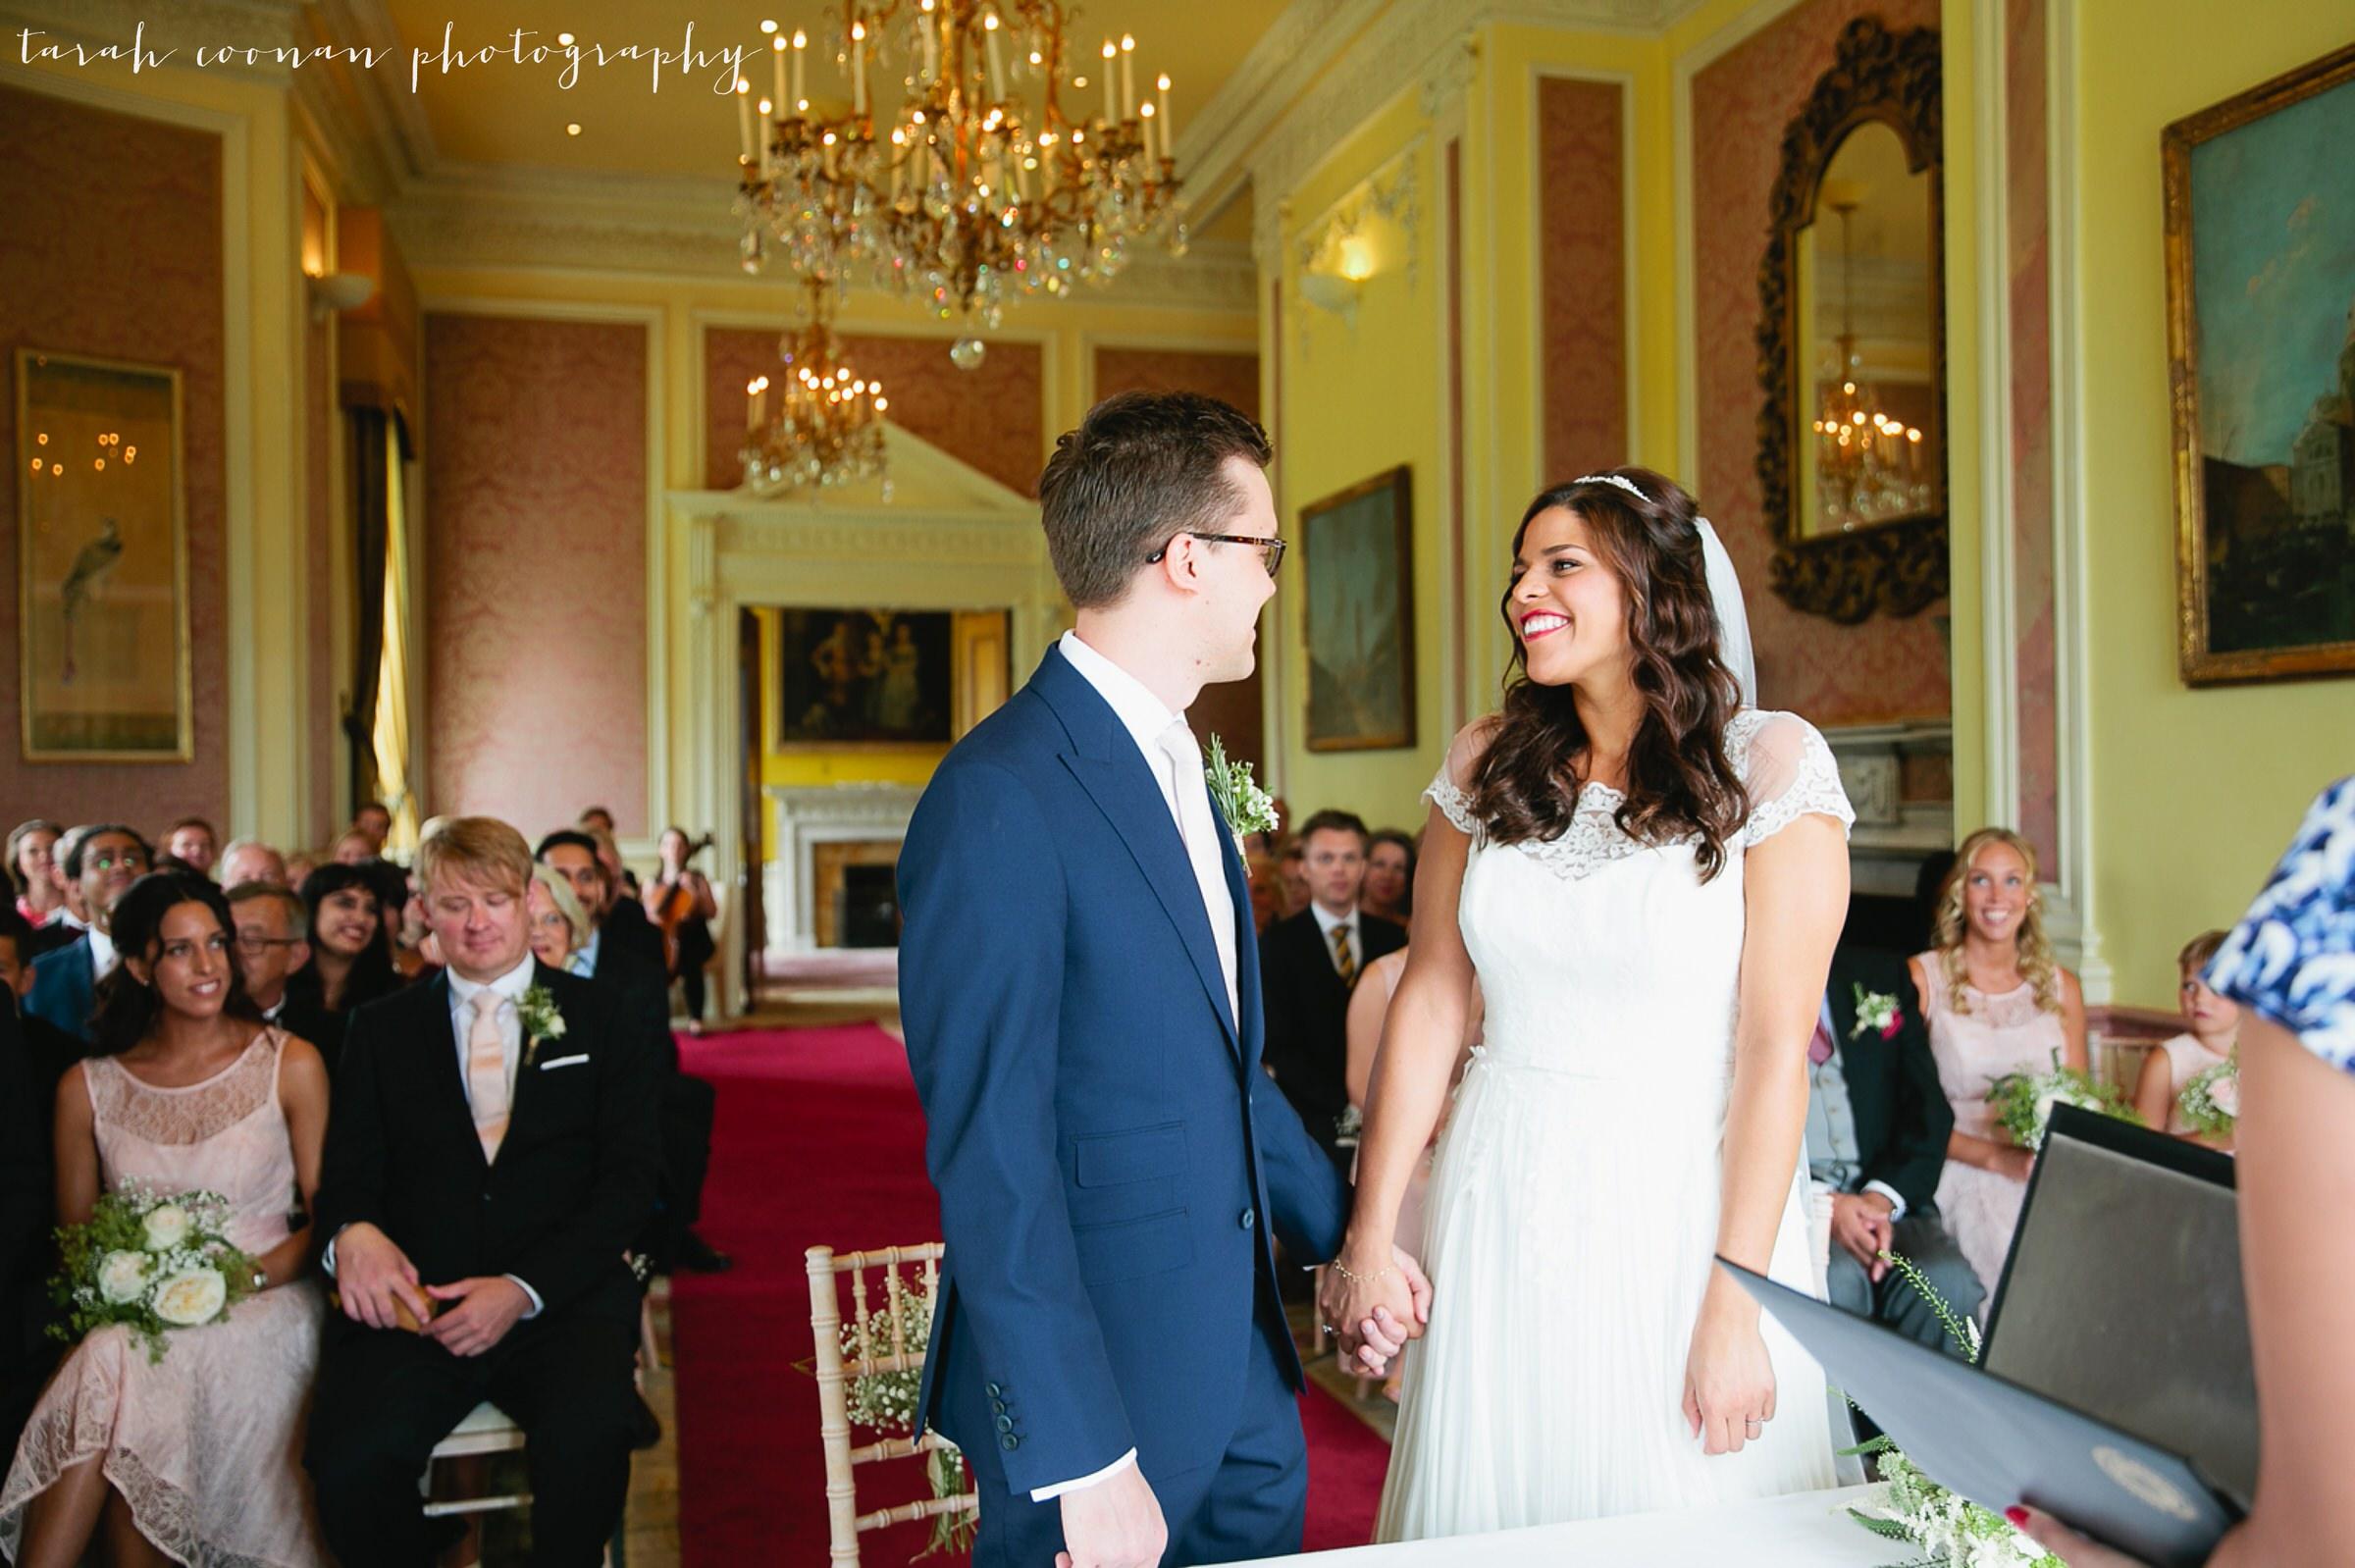 brighton-wedding-photographer17